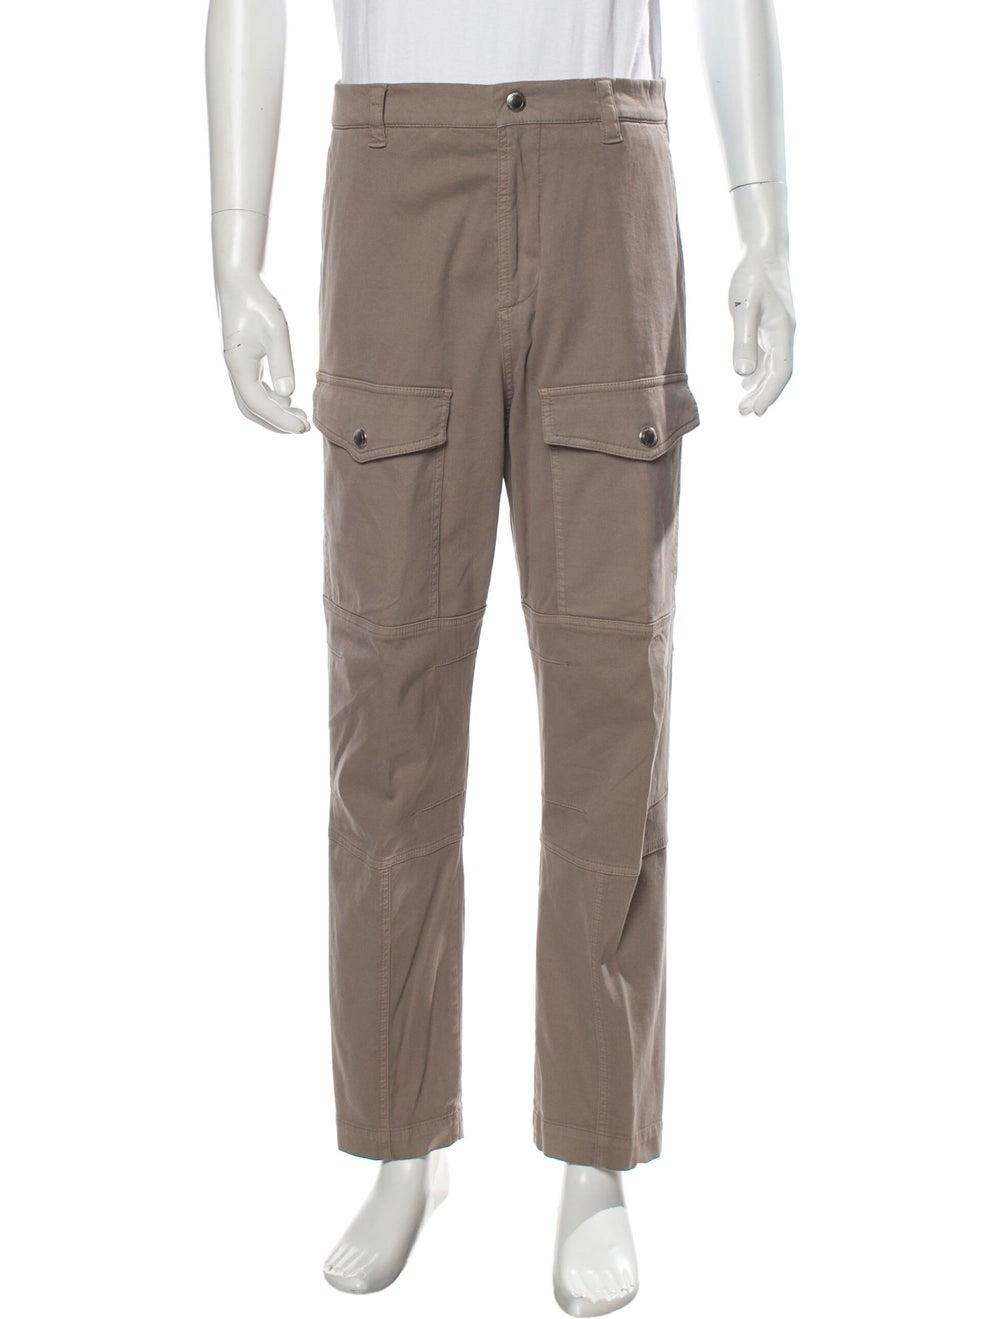 Brunello Cucinelli Cargo Pants - image 1